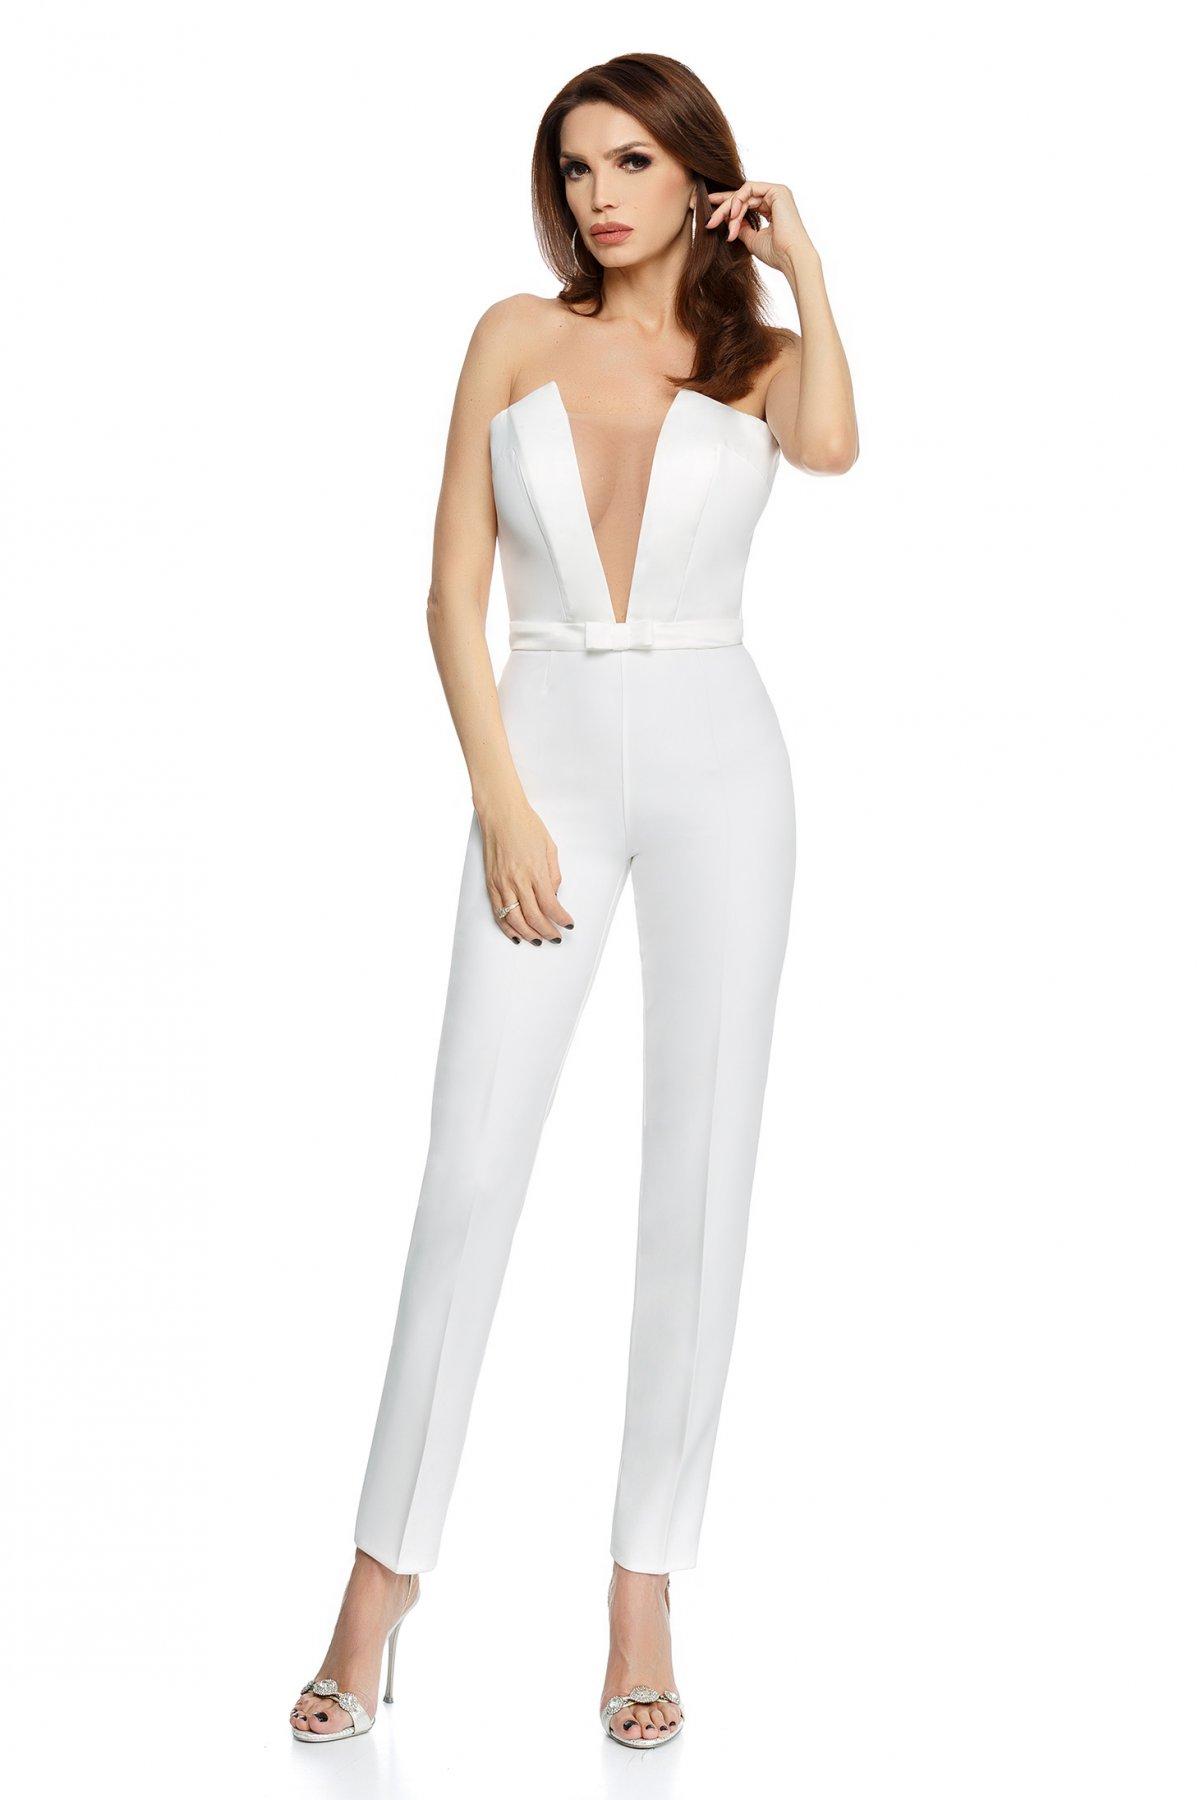 Salopeta alba eleganta cu pantaloni slim si corset cu decolteu adanc